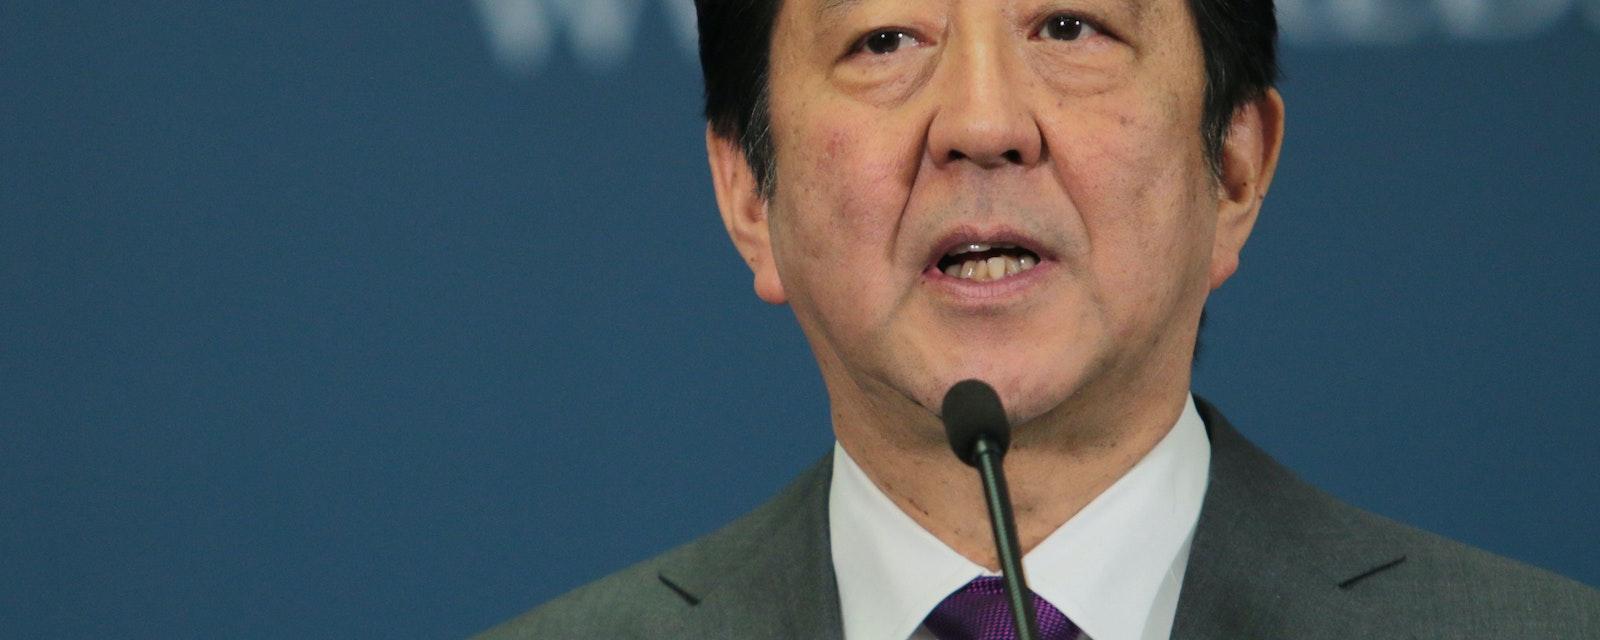 Portrait of Shinzo Abe